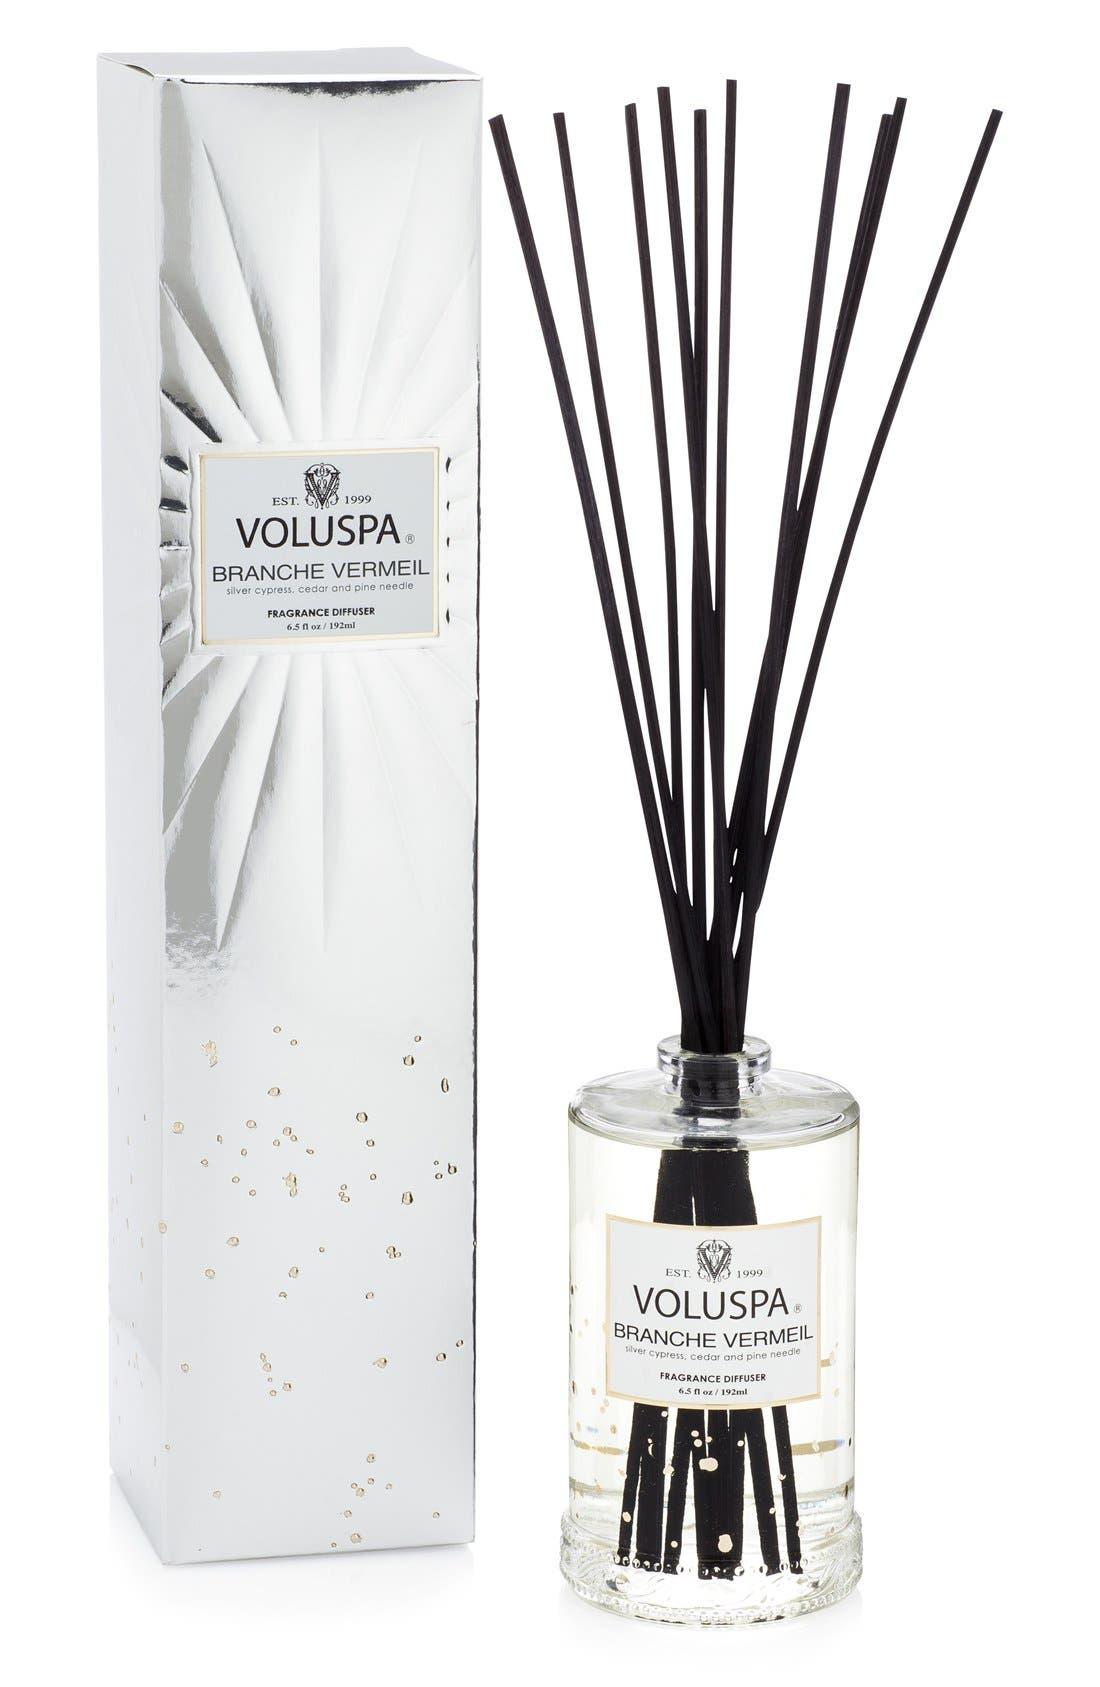 Voluspa'Vermeil - Branche Vermeil' Home Ambience Diffuser